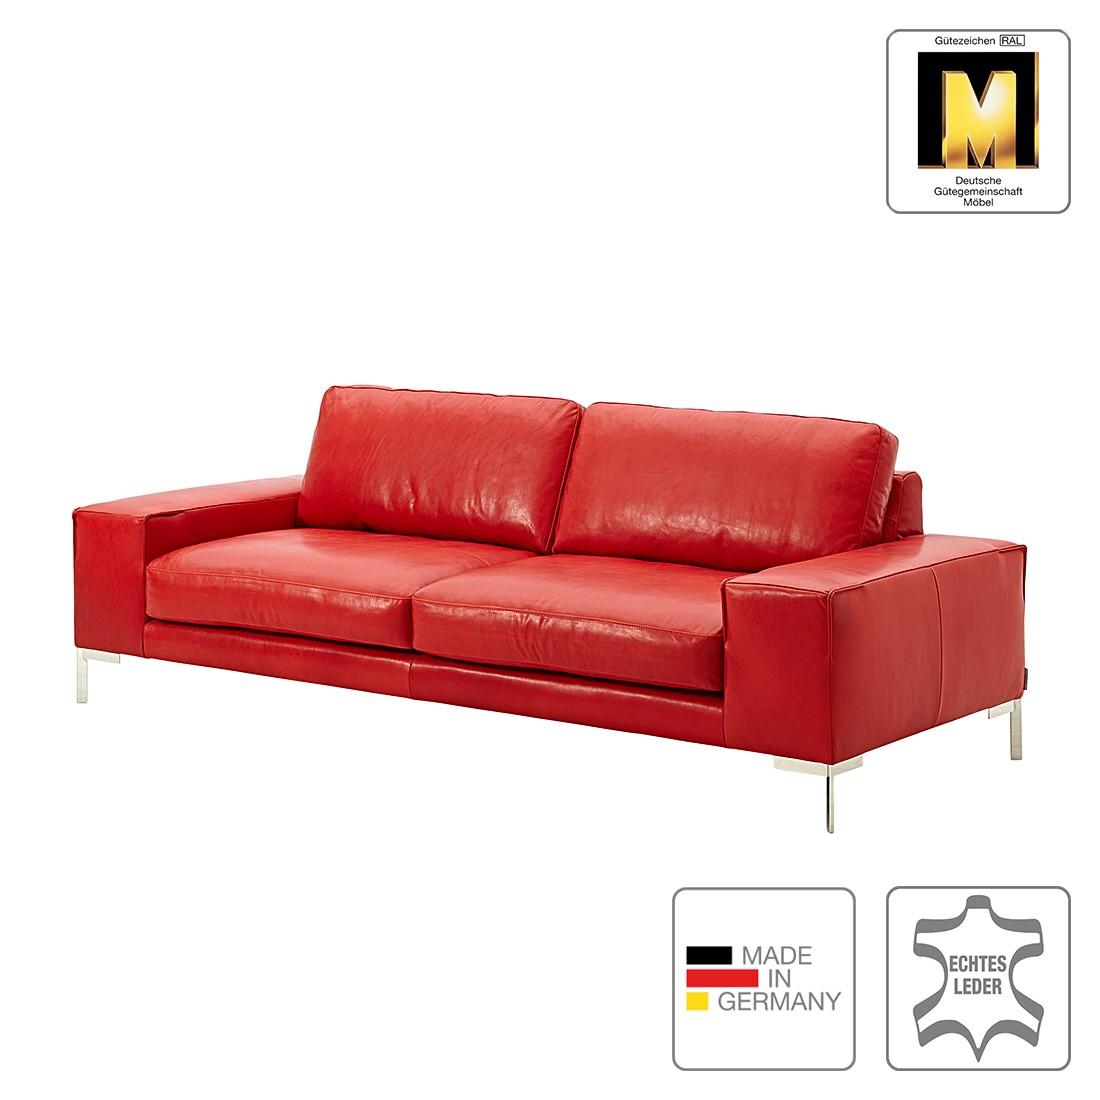 Ikea Rode Leren Bank.Fixias Com Ikea Bank Best Free Home Design Idea Inspiration